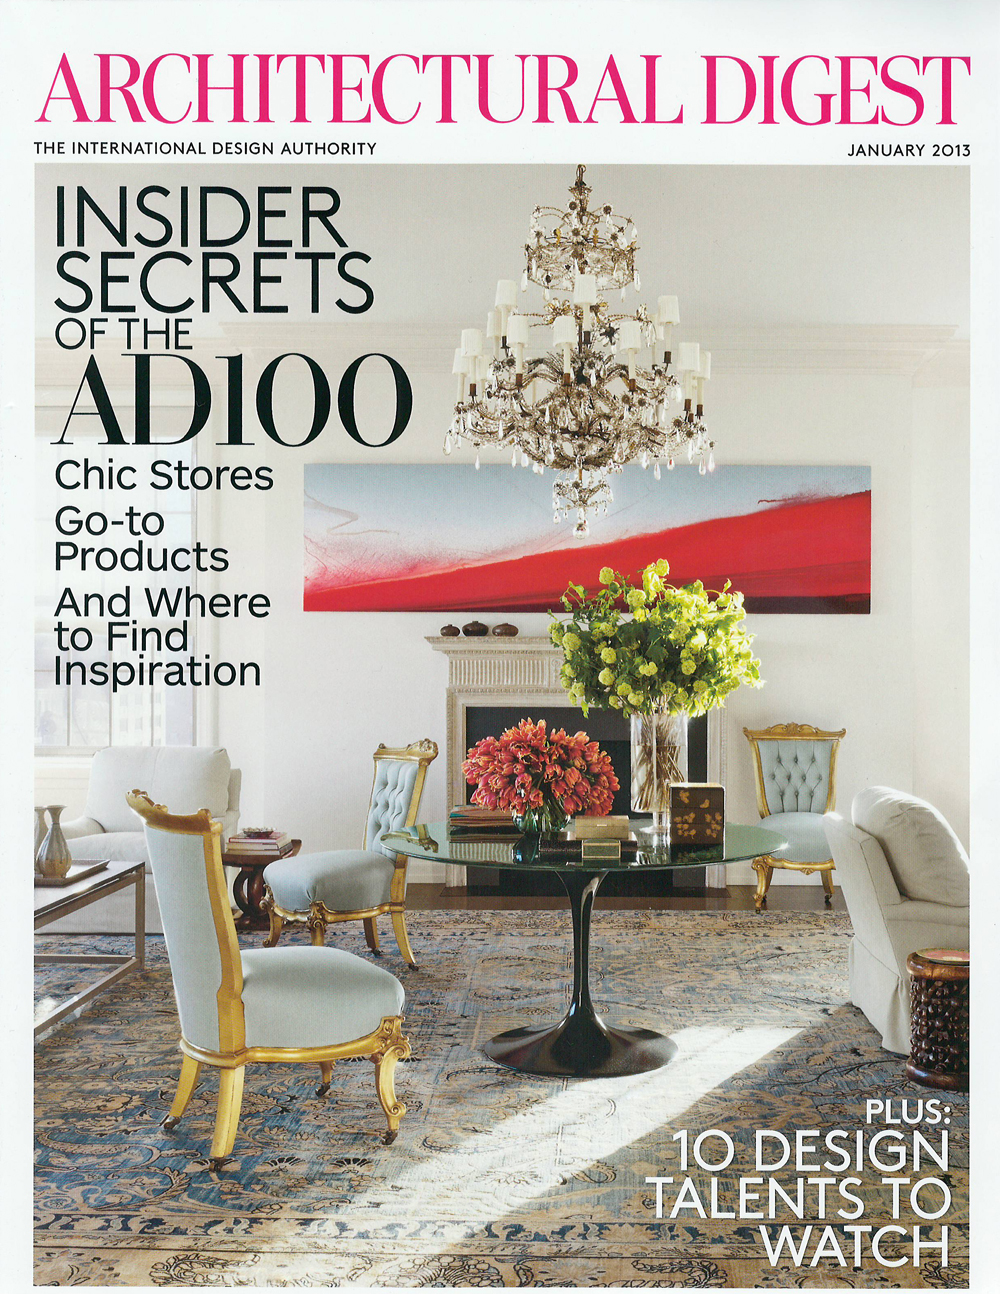 Architectural Digest, enero 2013